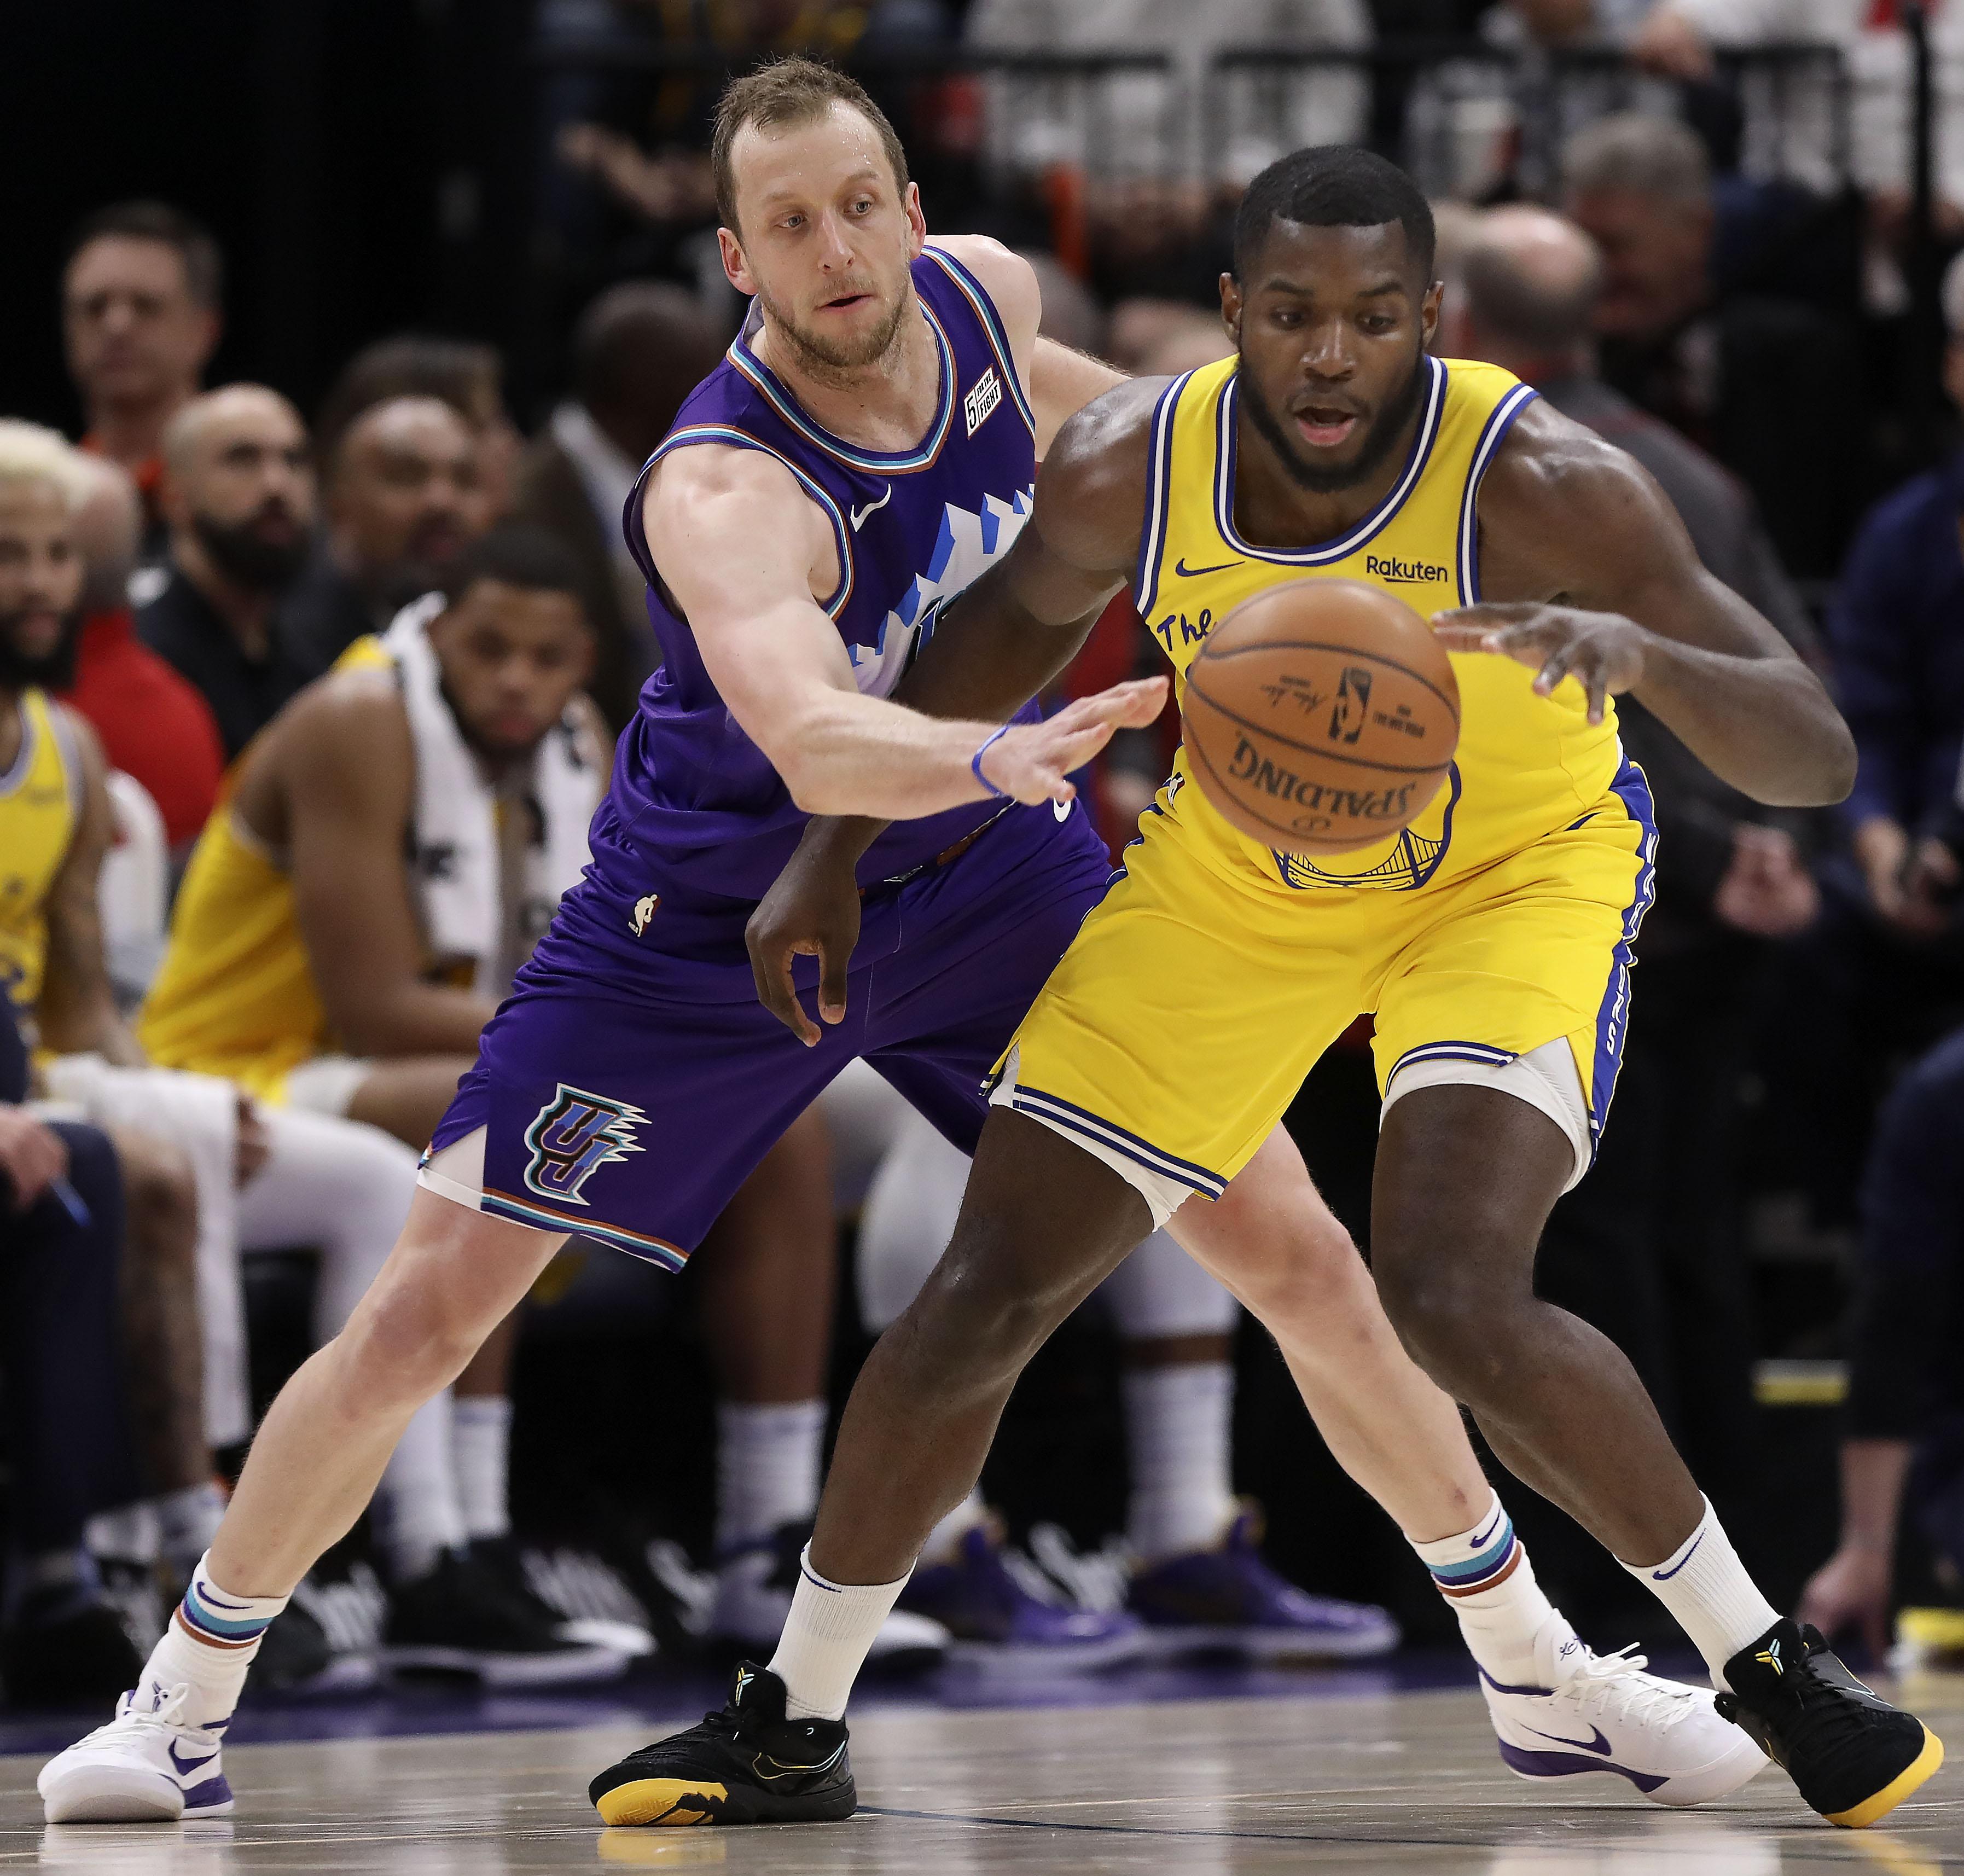 Utah Jazz forward Joe Ingles guards Golden State Warriors Eric Paschall at Vivint Arena in Salt Lake City on Friday, Nov. 22, 2019.